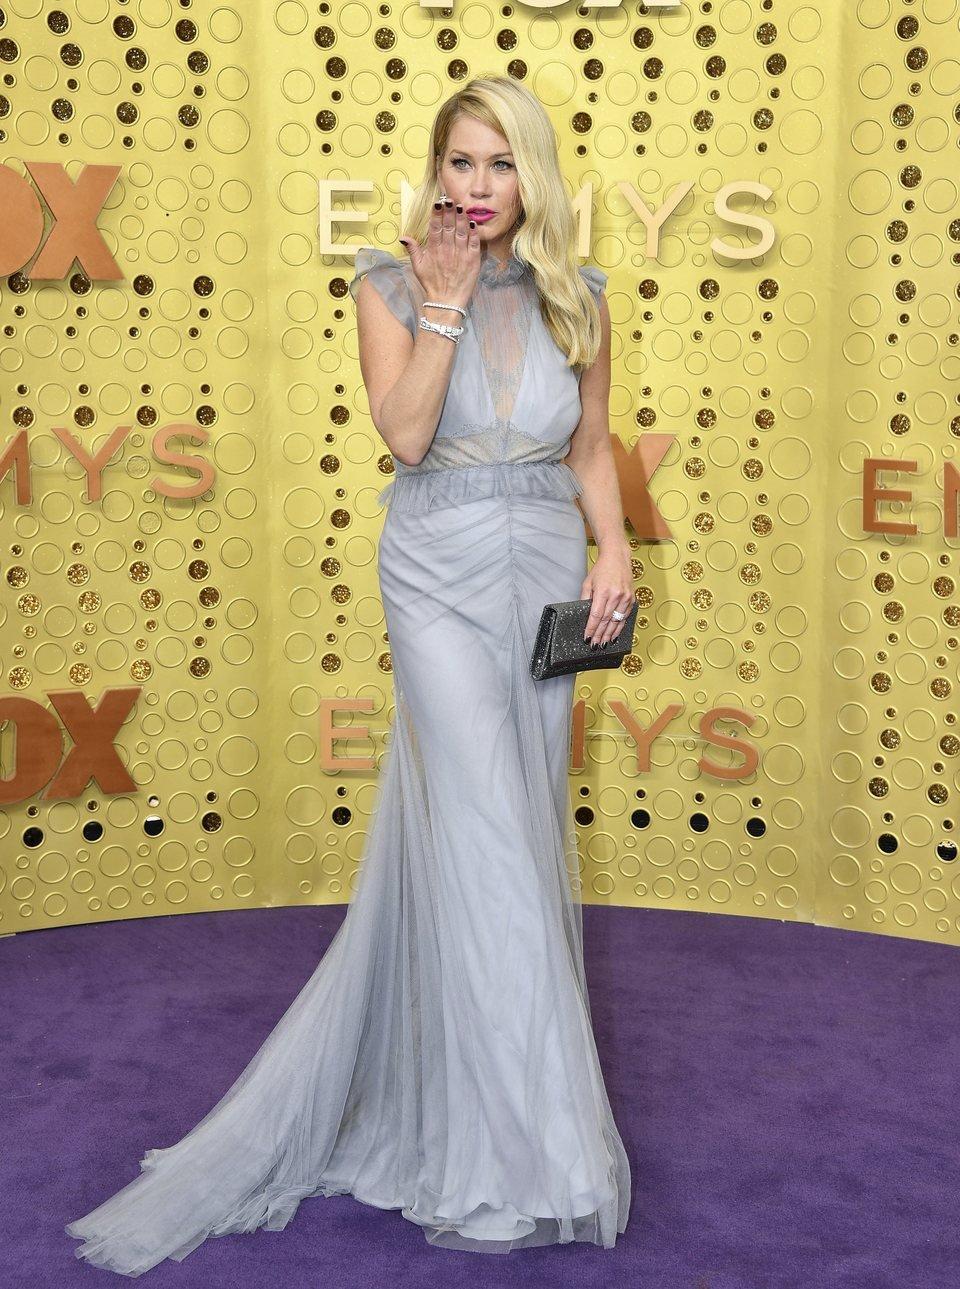 Christina Applegate at the Emmy 2019 red carpet